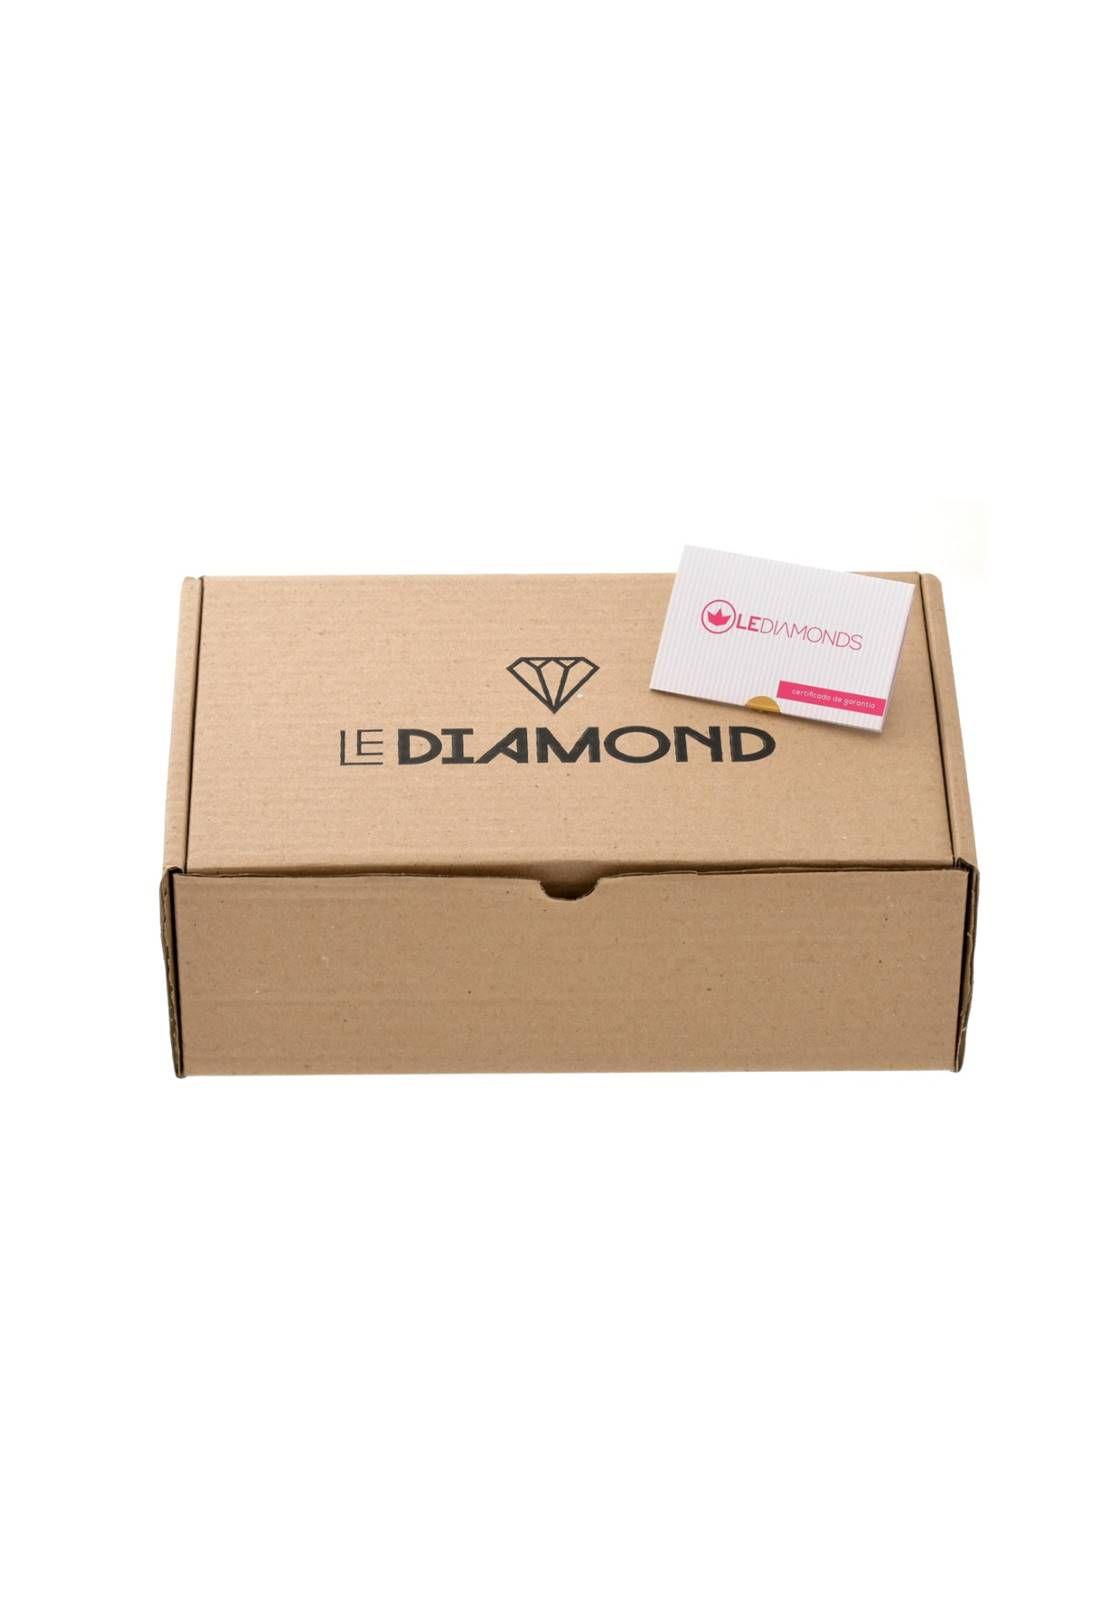 Brinco Argola Le Diamond Fios De Seda Stela Dourado